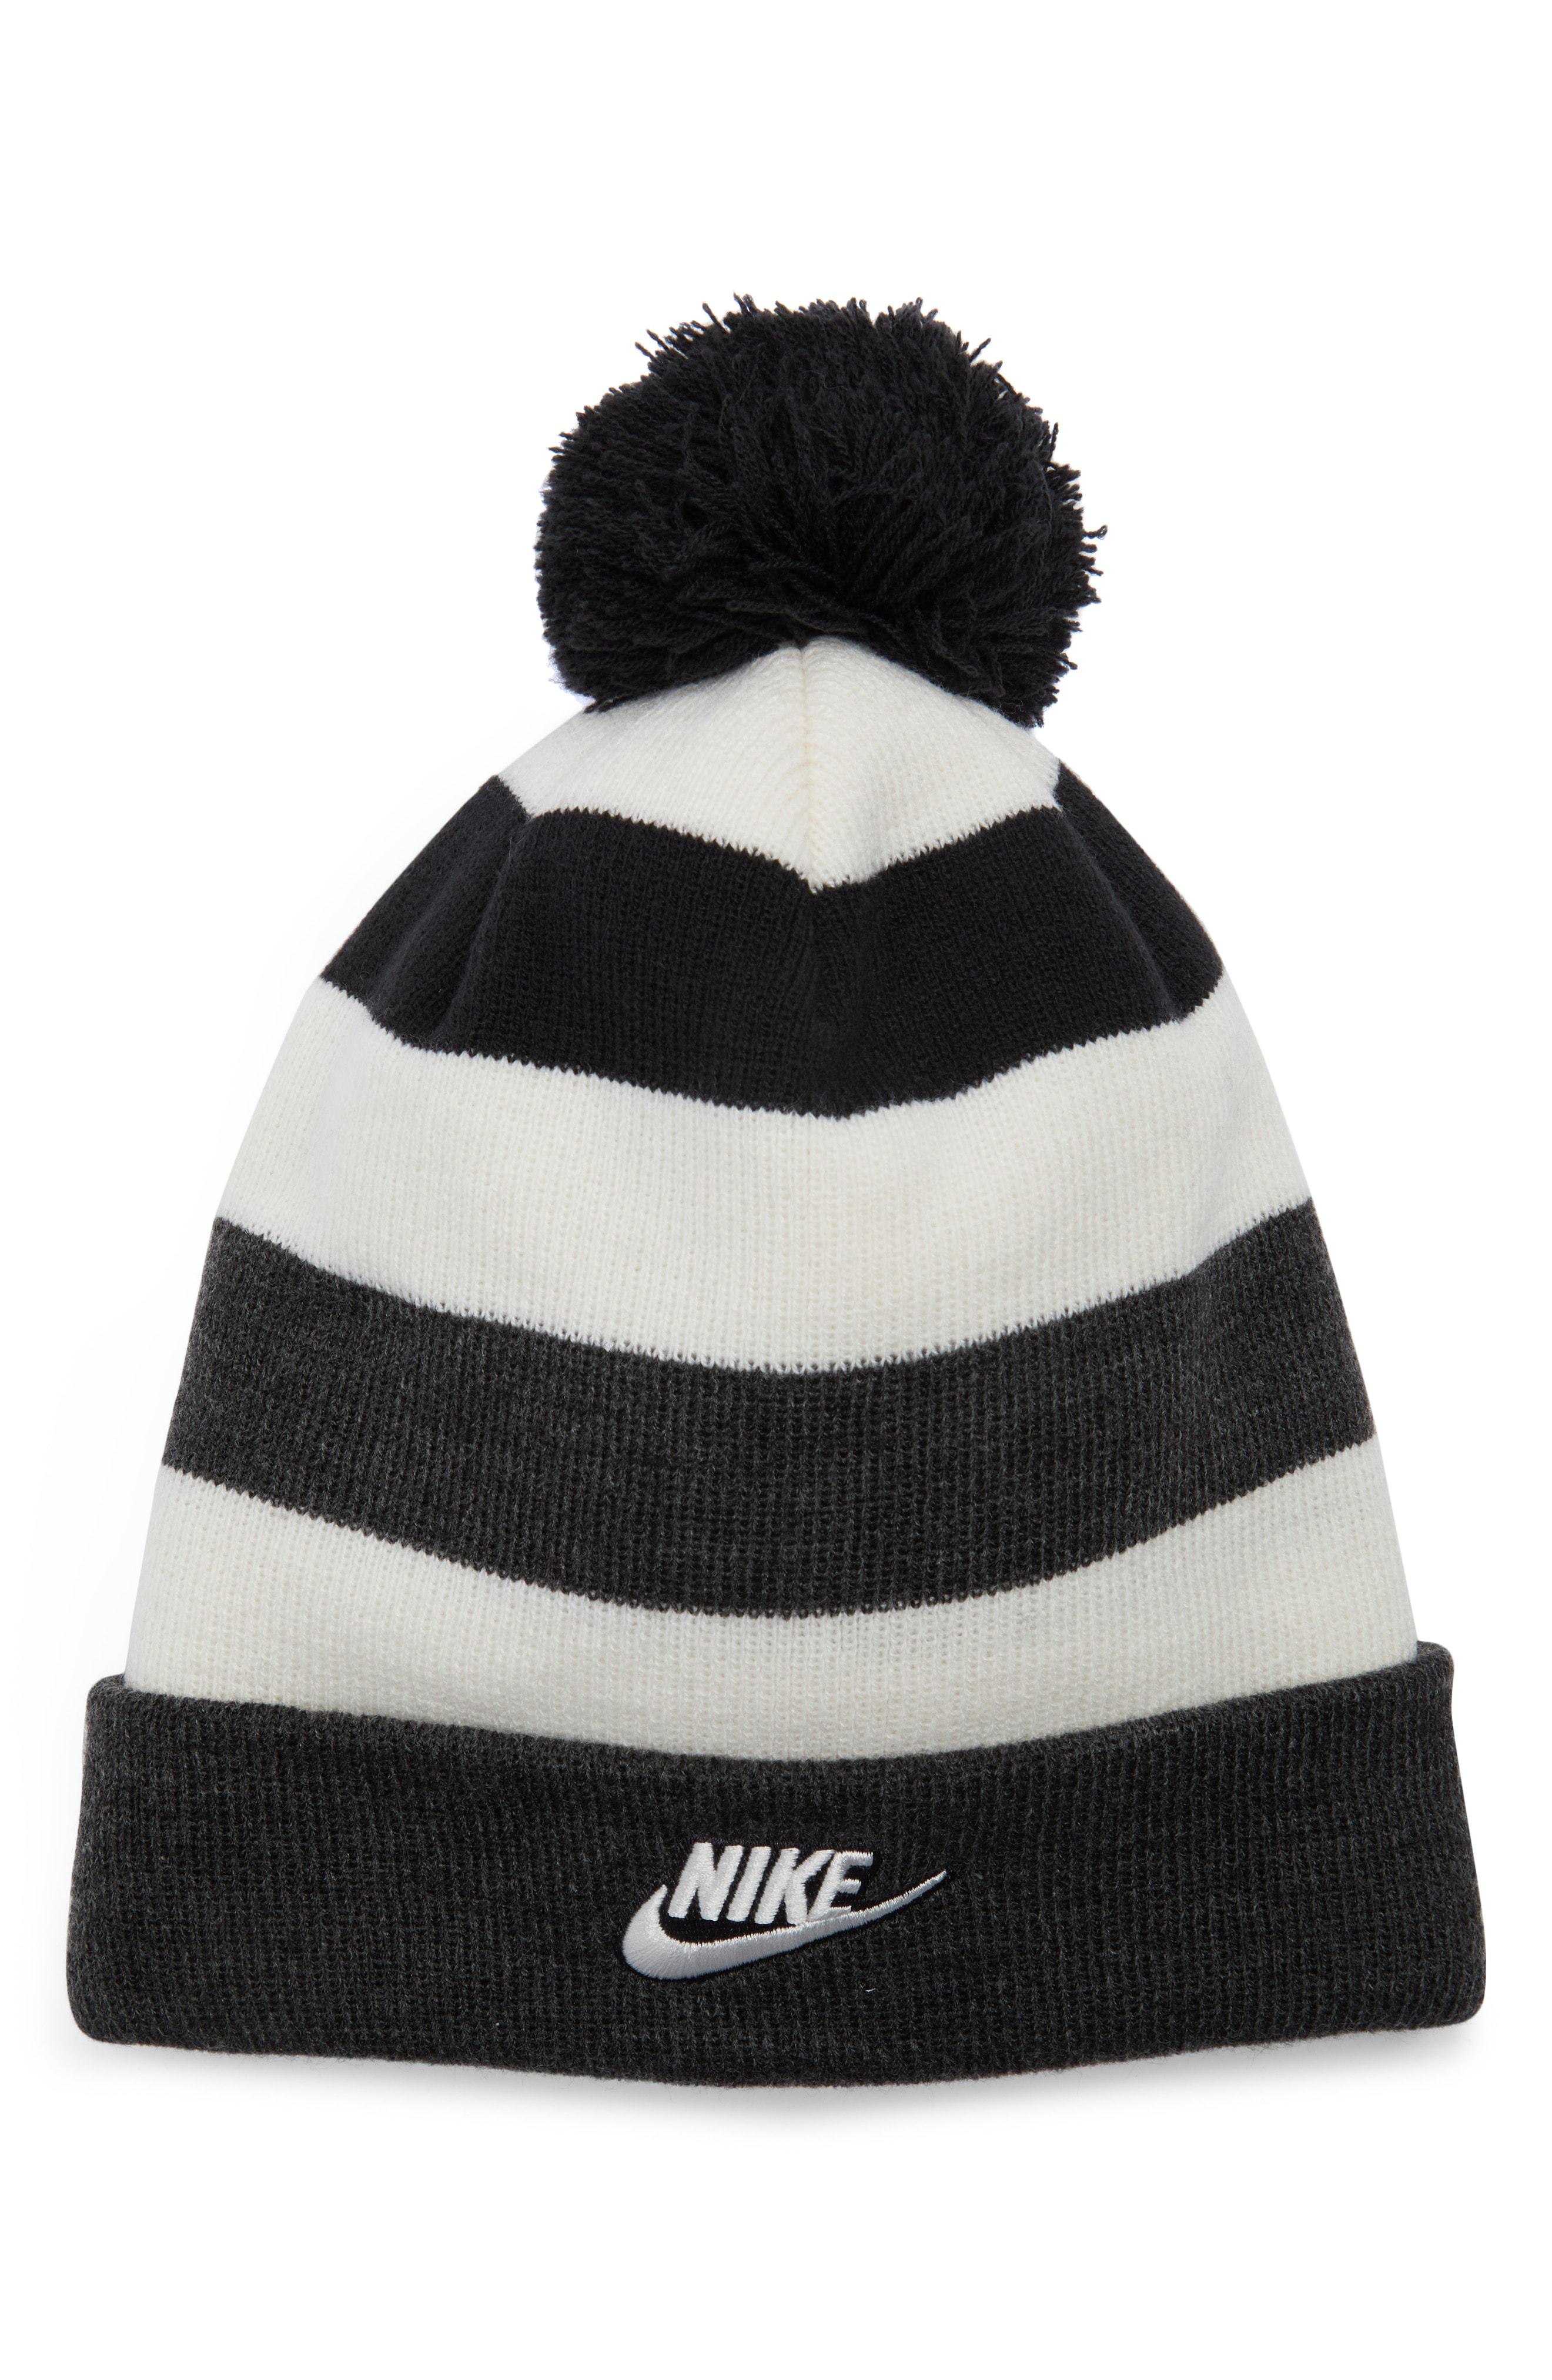 Lyst - Nike Sportswear Women s Beanie in Black db78a84246fa